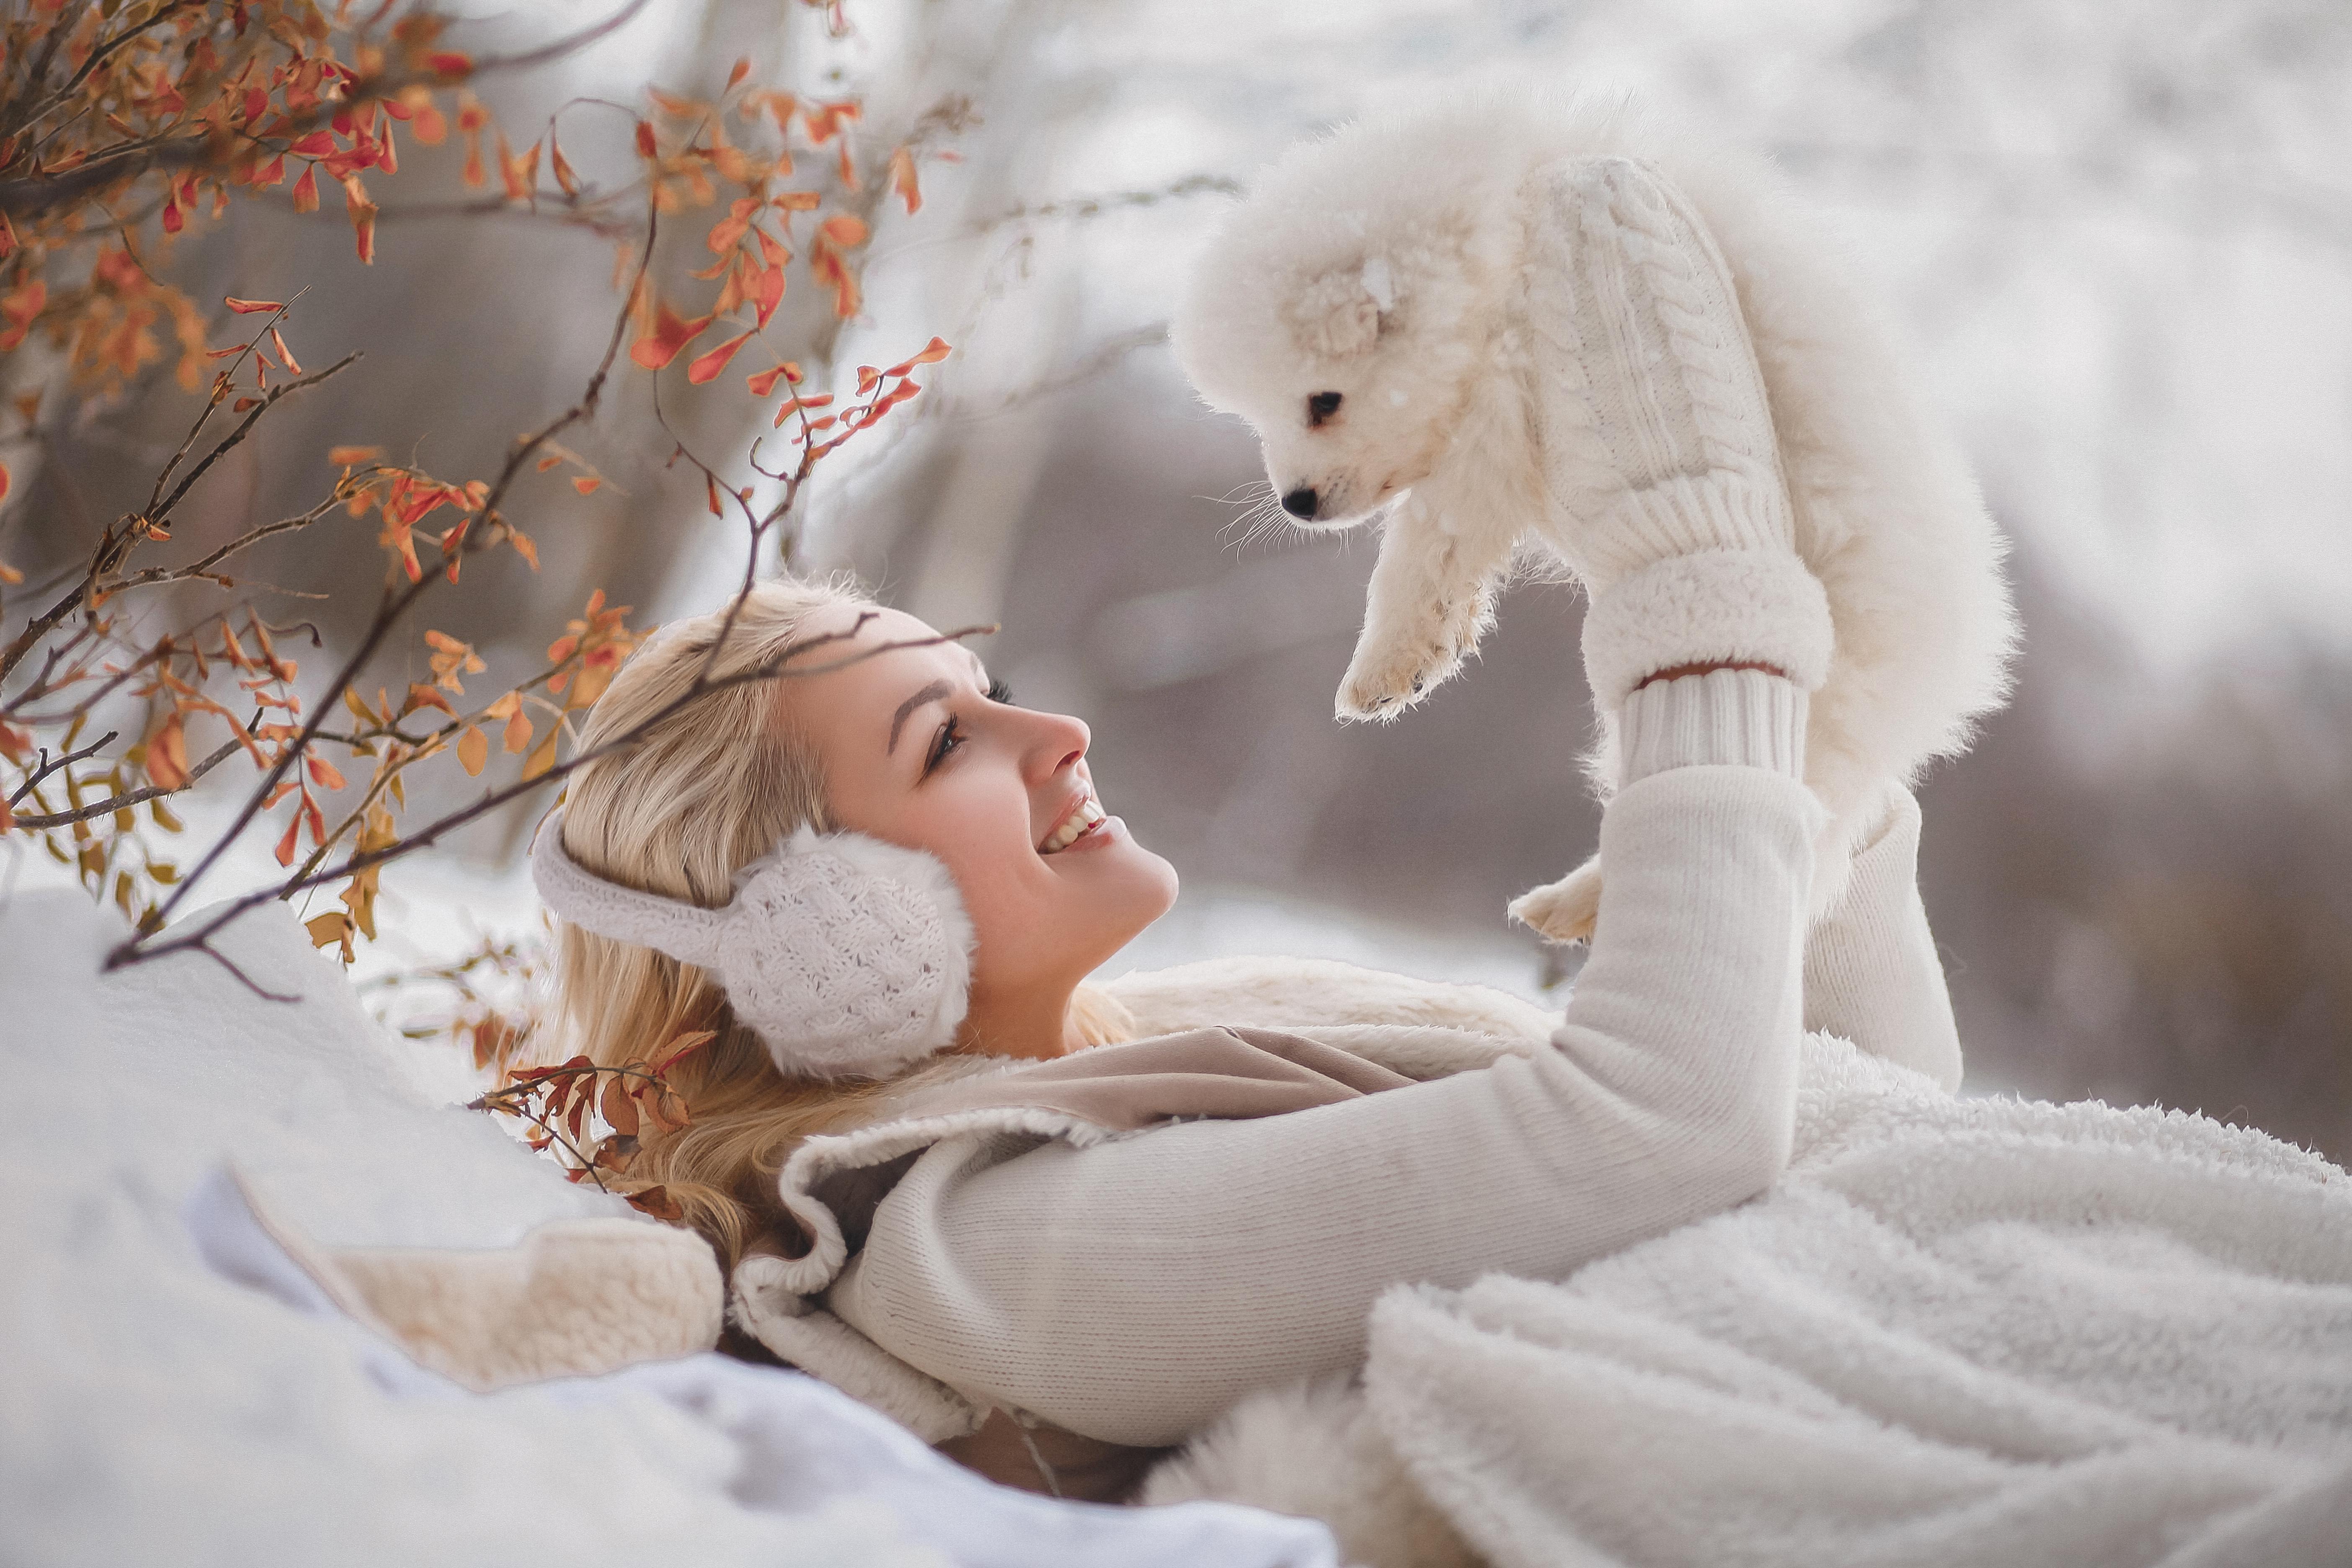 зимний портрет девушки с щенками хаски